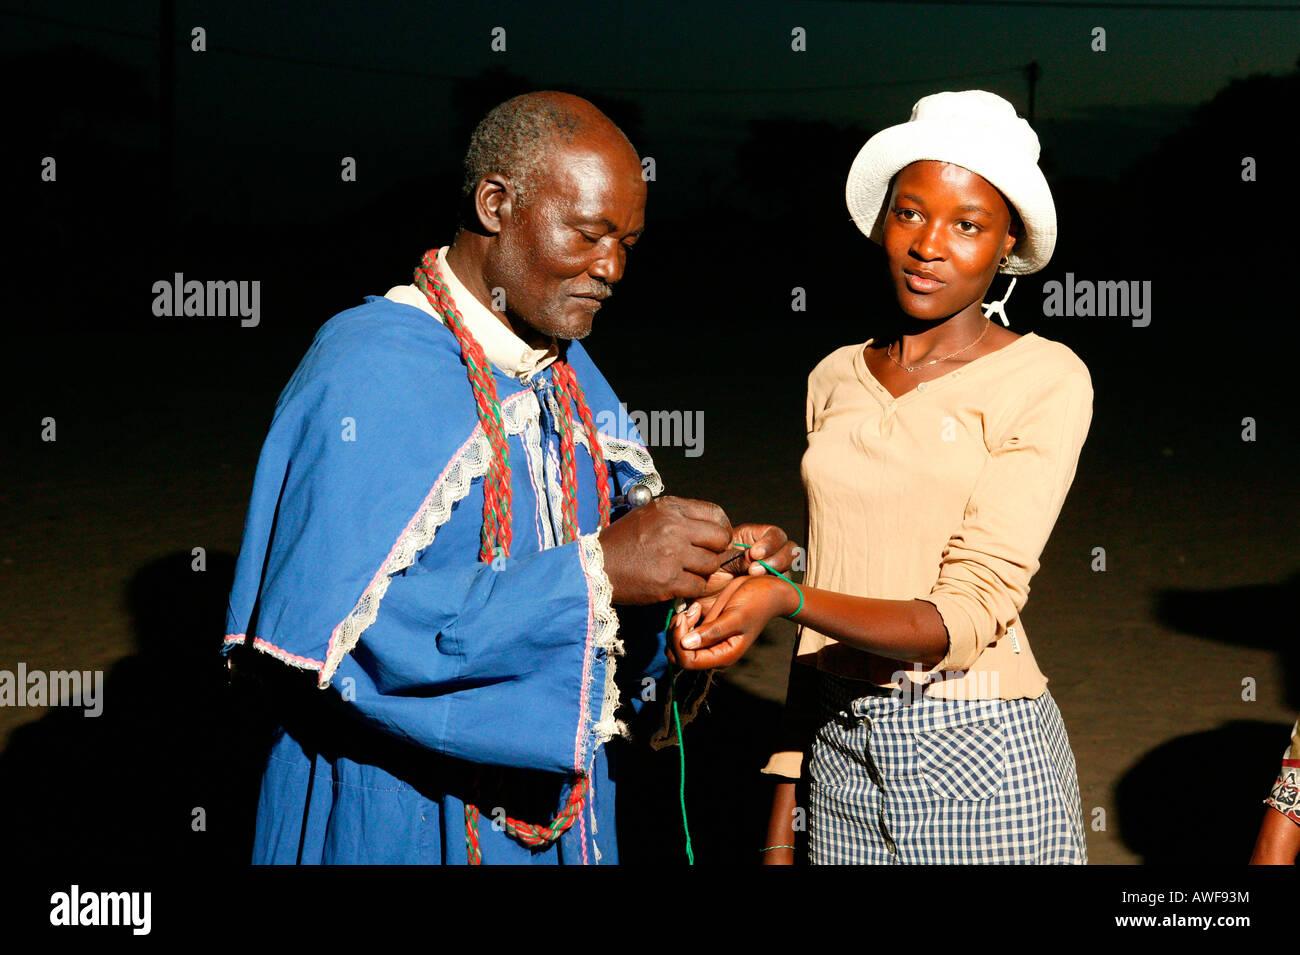 Faith healer, Pentecostal community, Sehitwa, Botswana, Africa Stock Photo